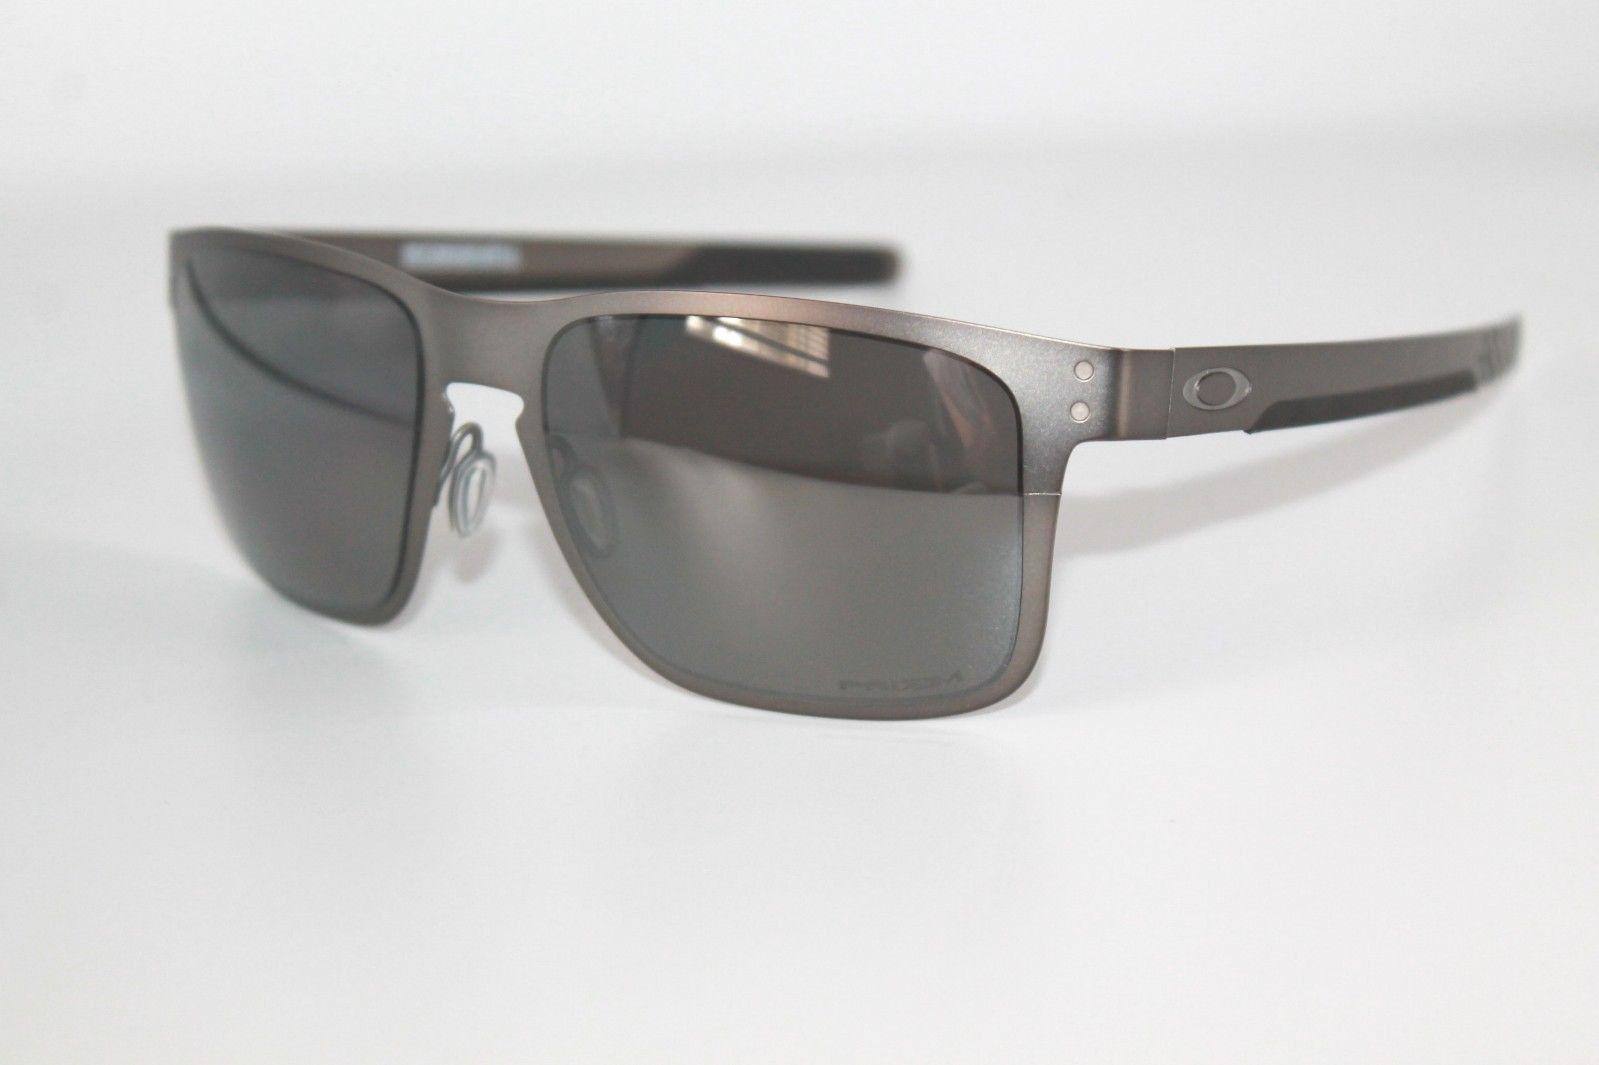 ab48c9c8cc Oakley Holbrook Metal Polarized Sunglasses and 50 similar items. 57